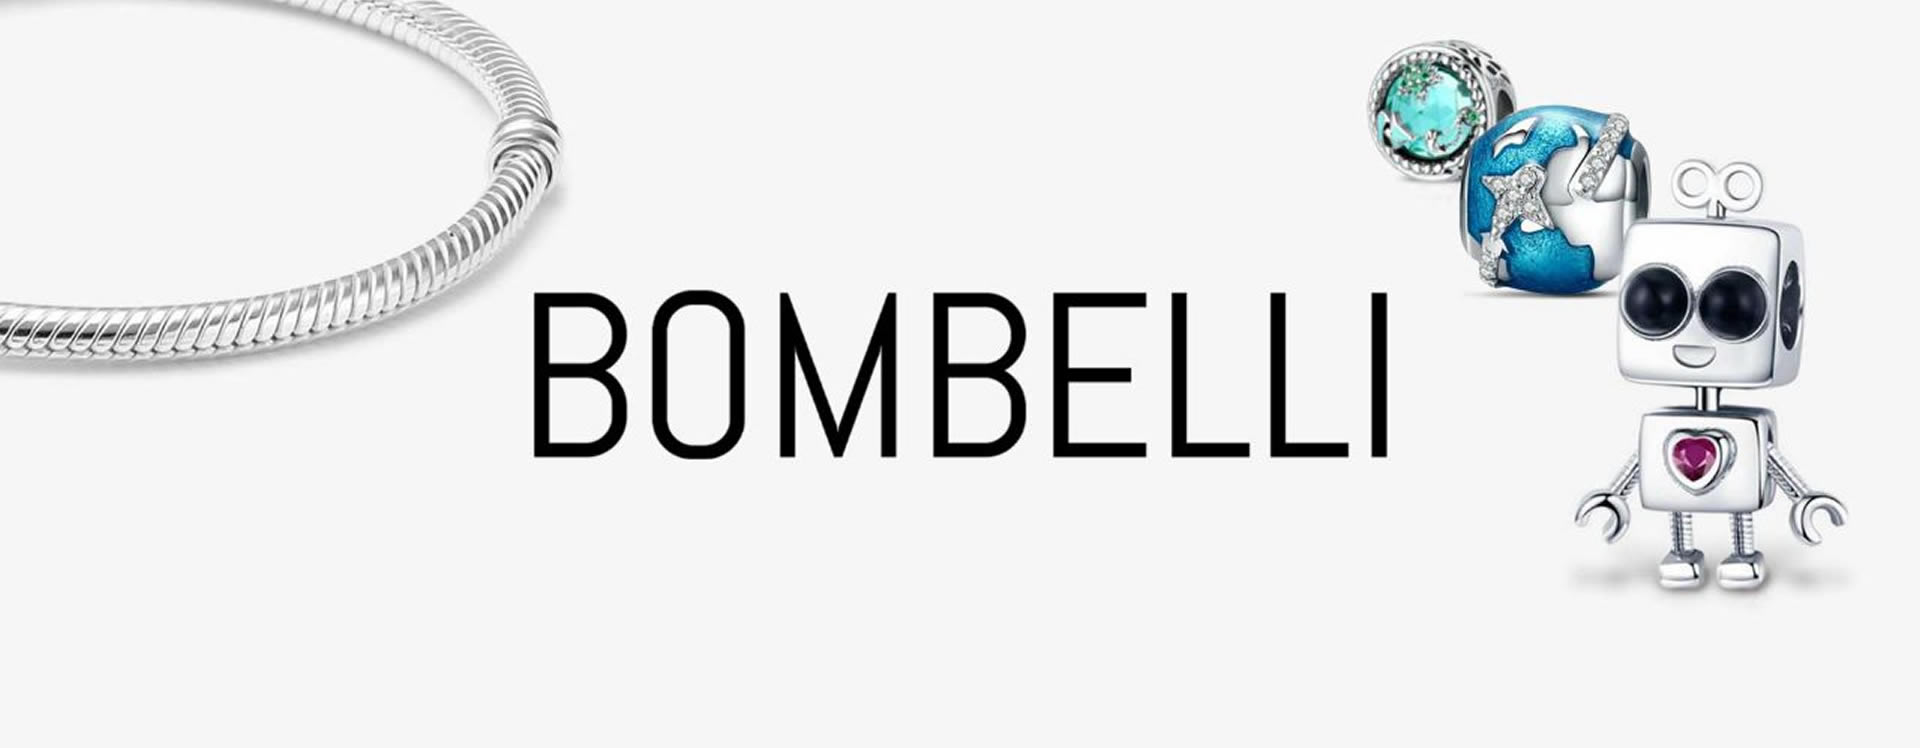 Strategia inbound marketing mondo fashion Bombelli Gioielli